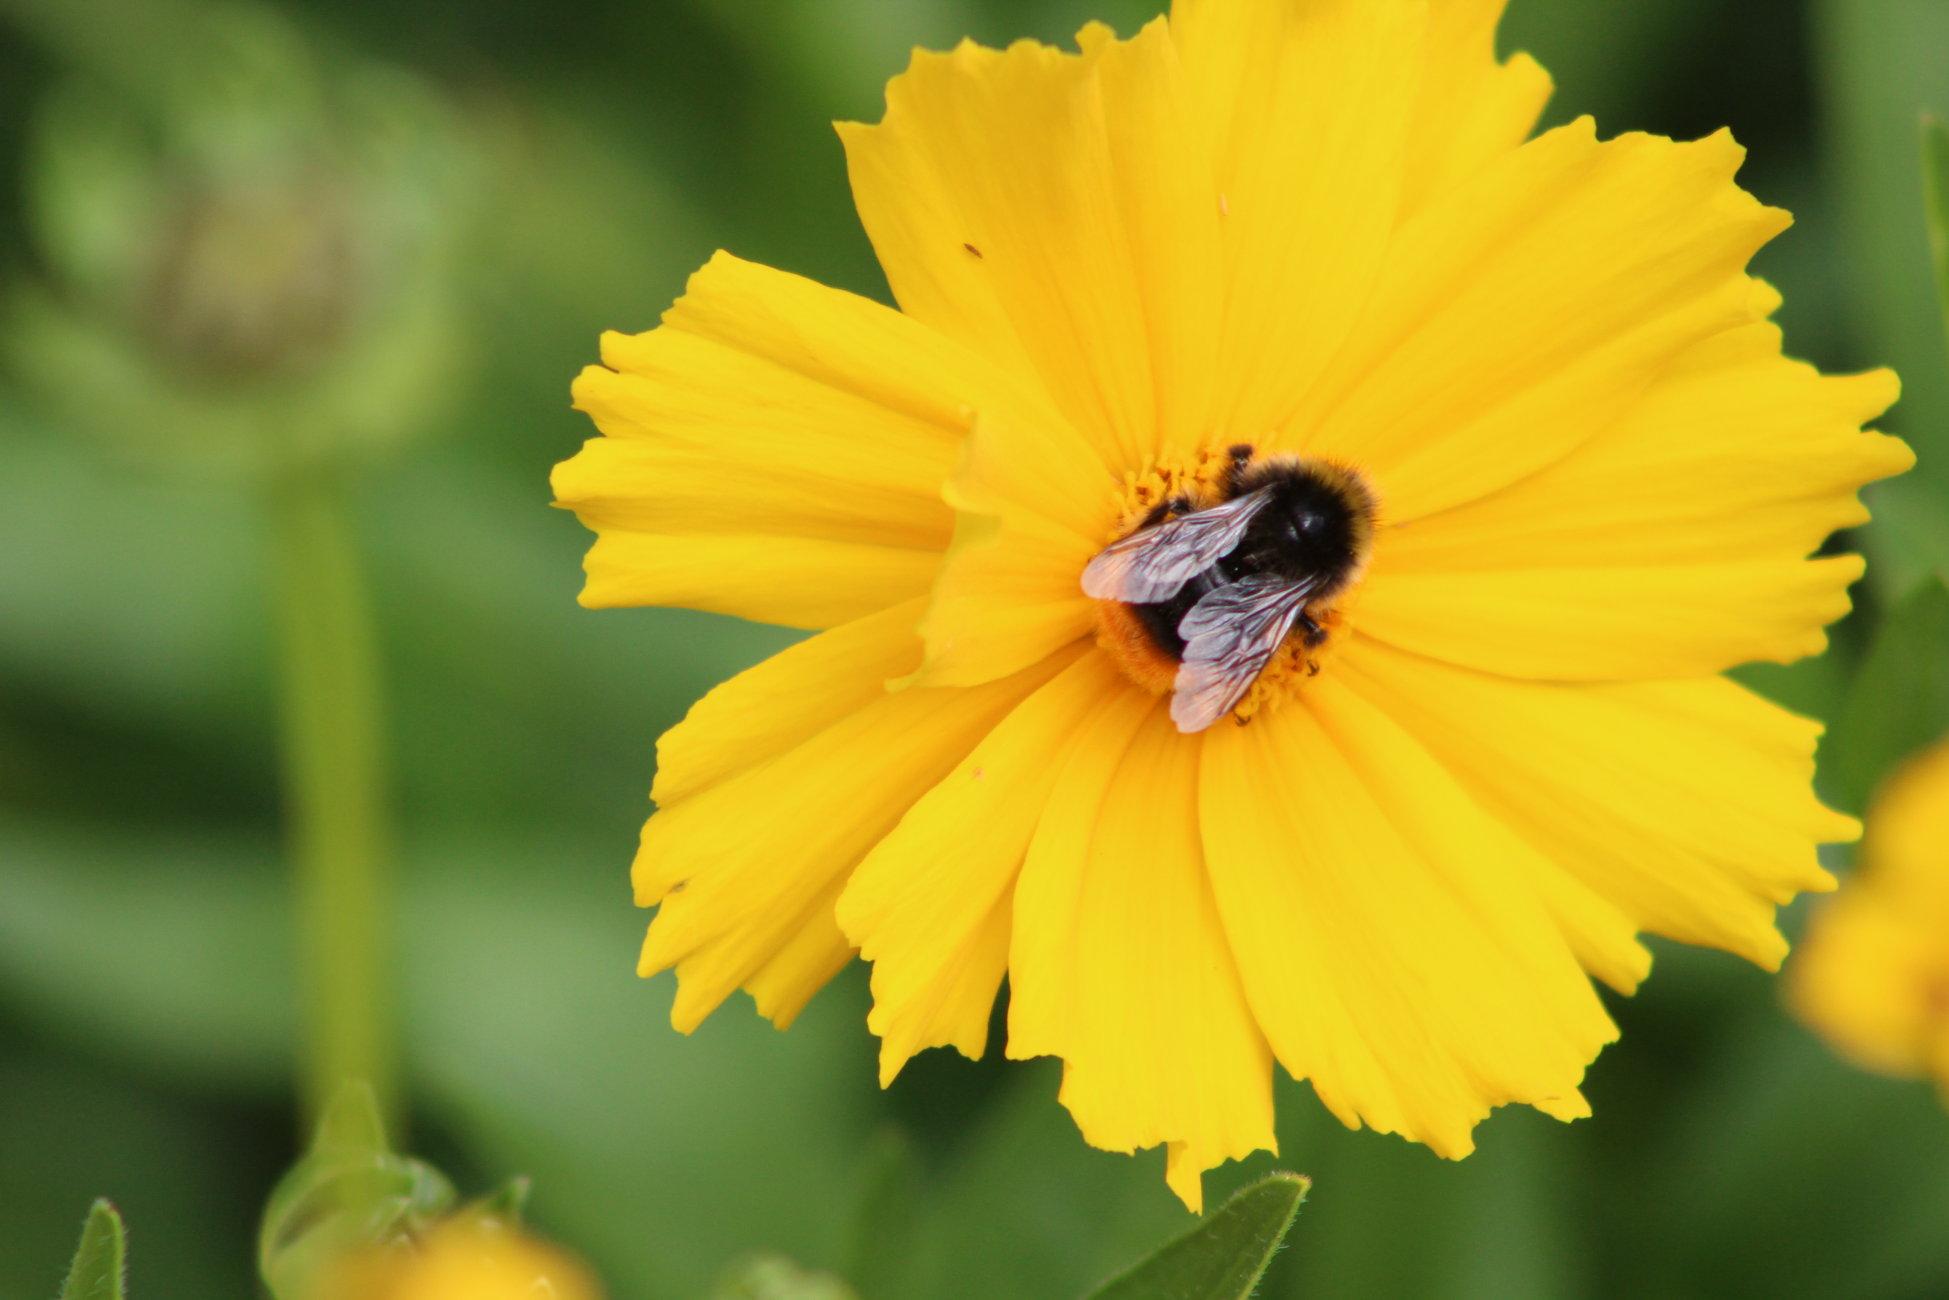 Bee enjoying a snack July 2020